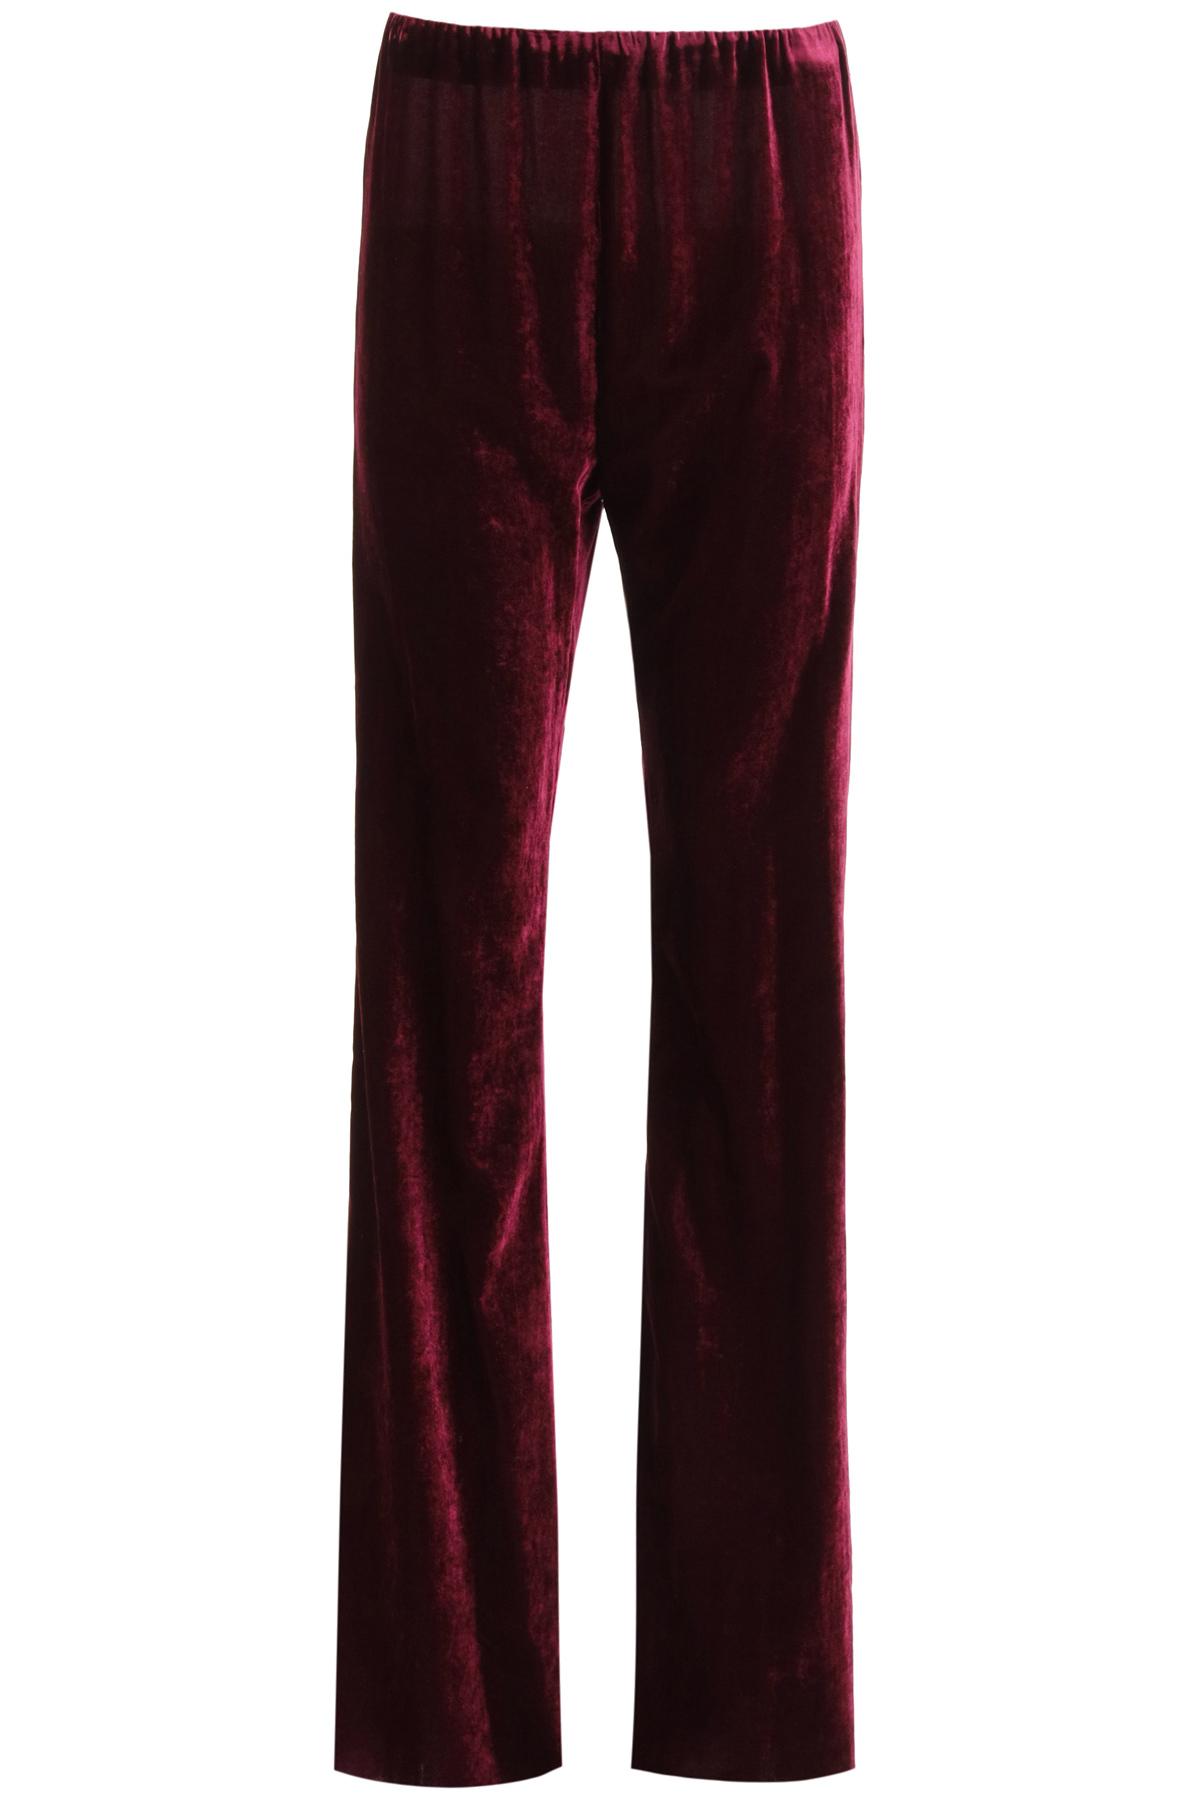 Raf simons pantaloni in velluto